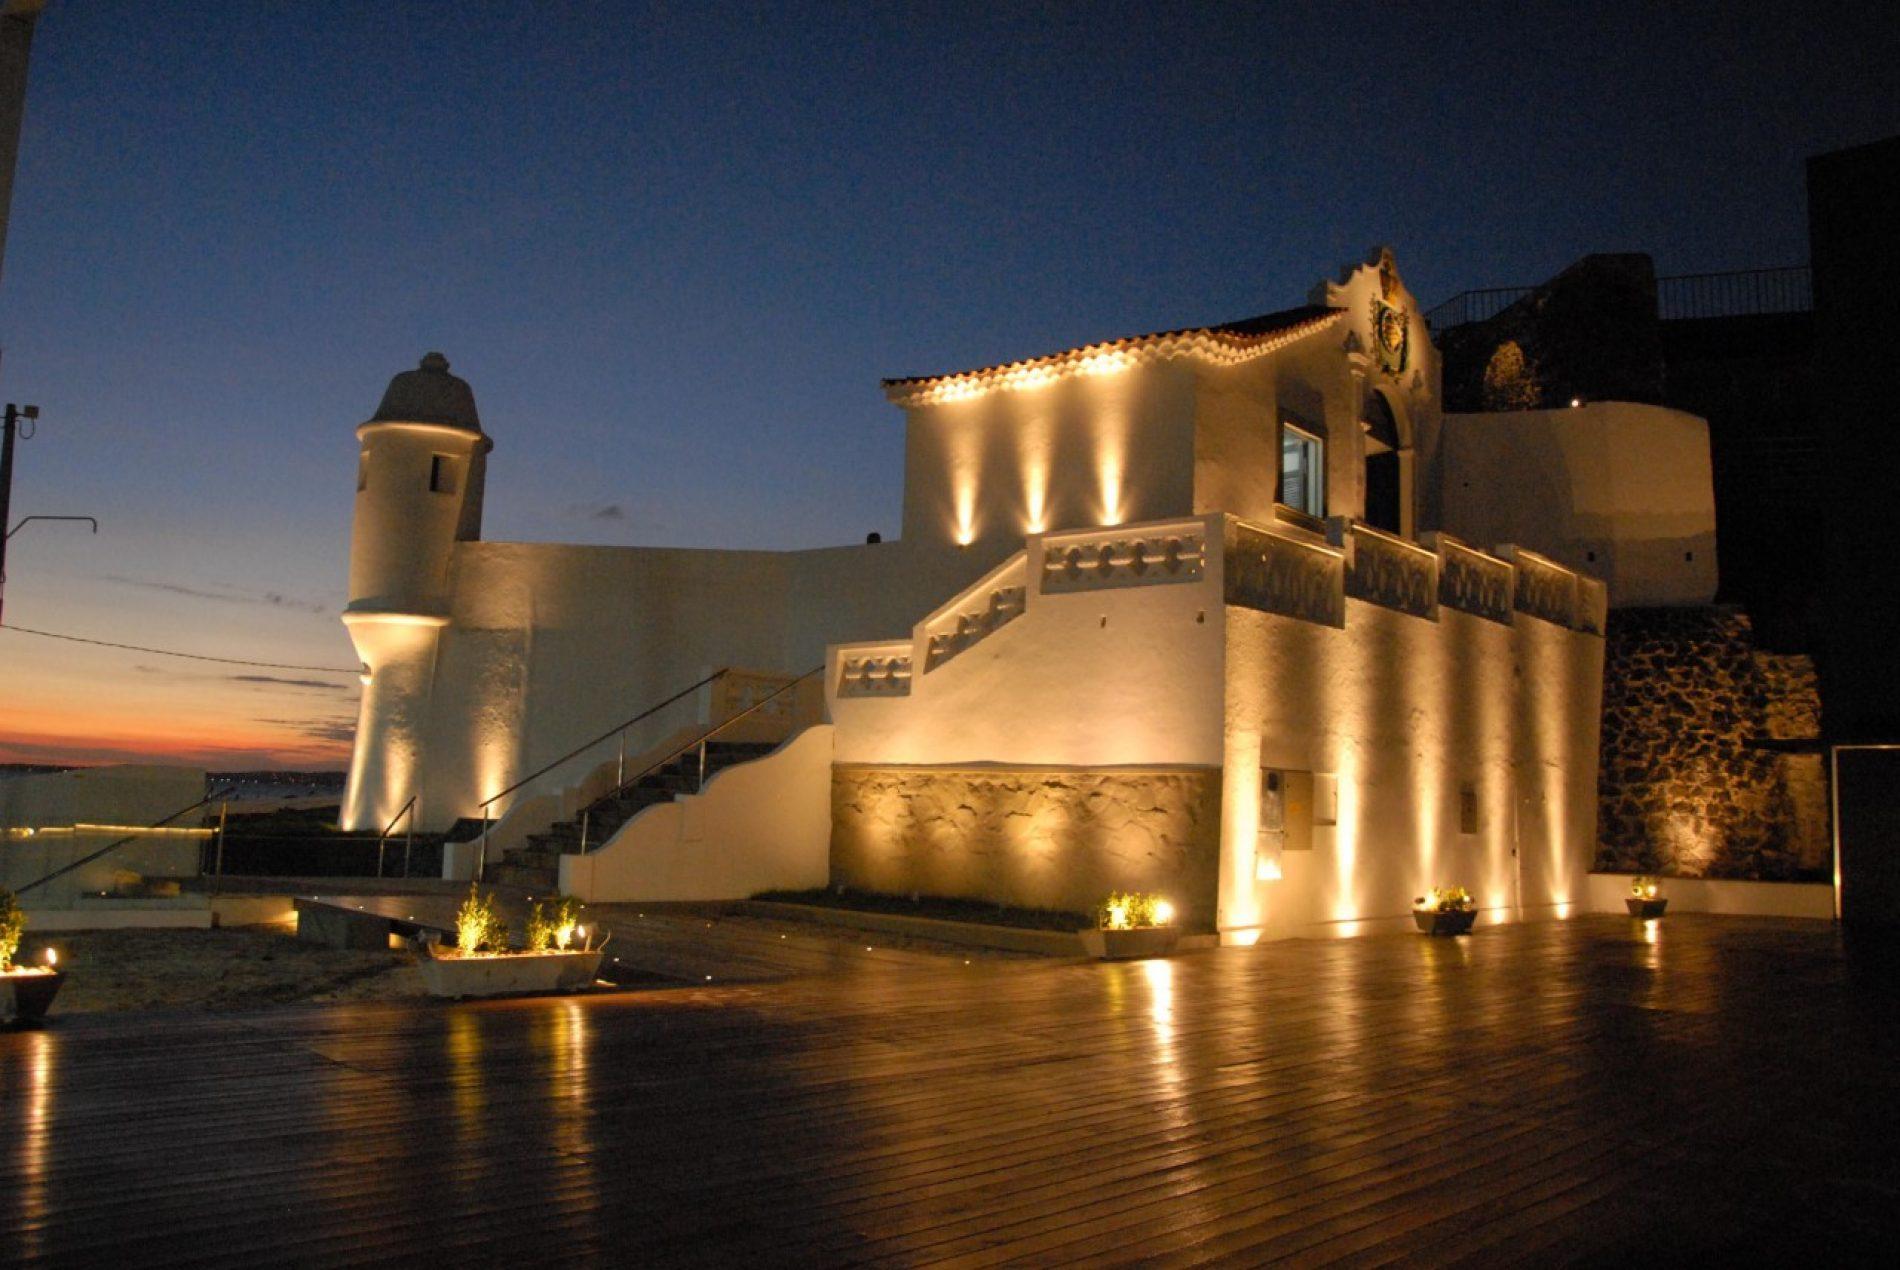 Cinco fortes de Salvador concorrem ao título de Patrimônio Mundial pela Unesco